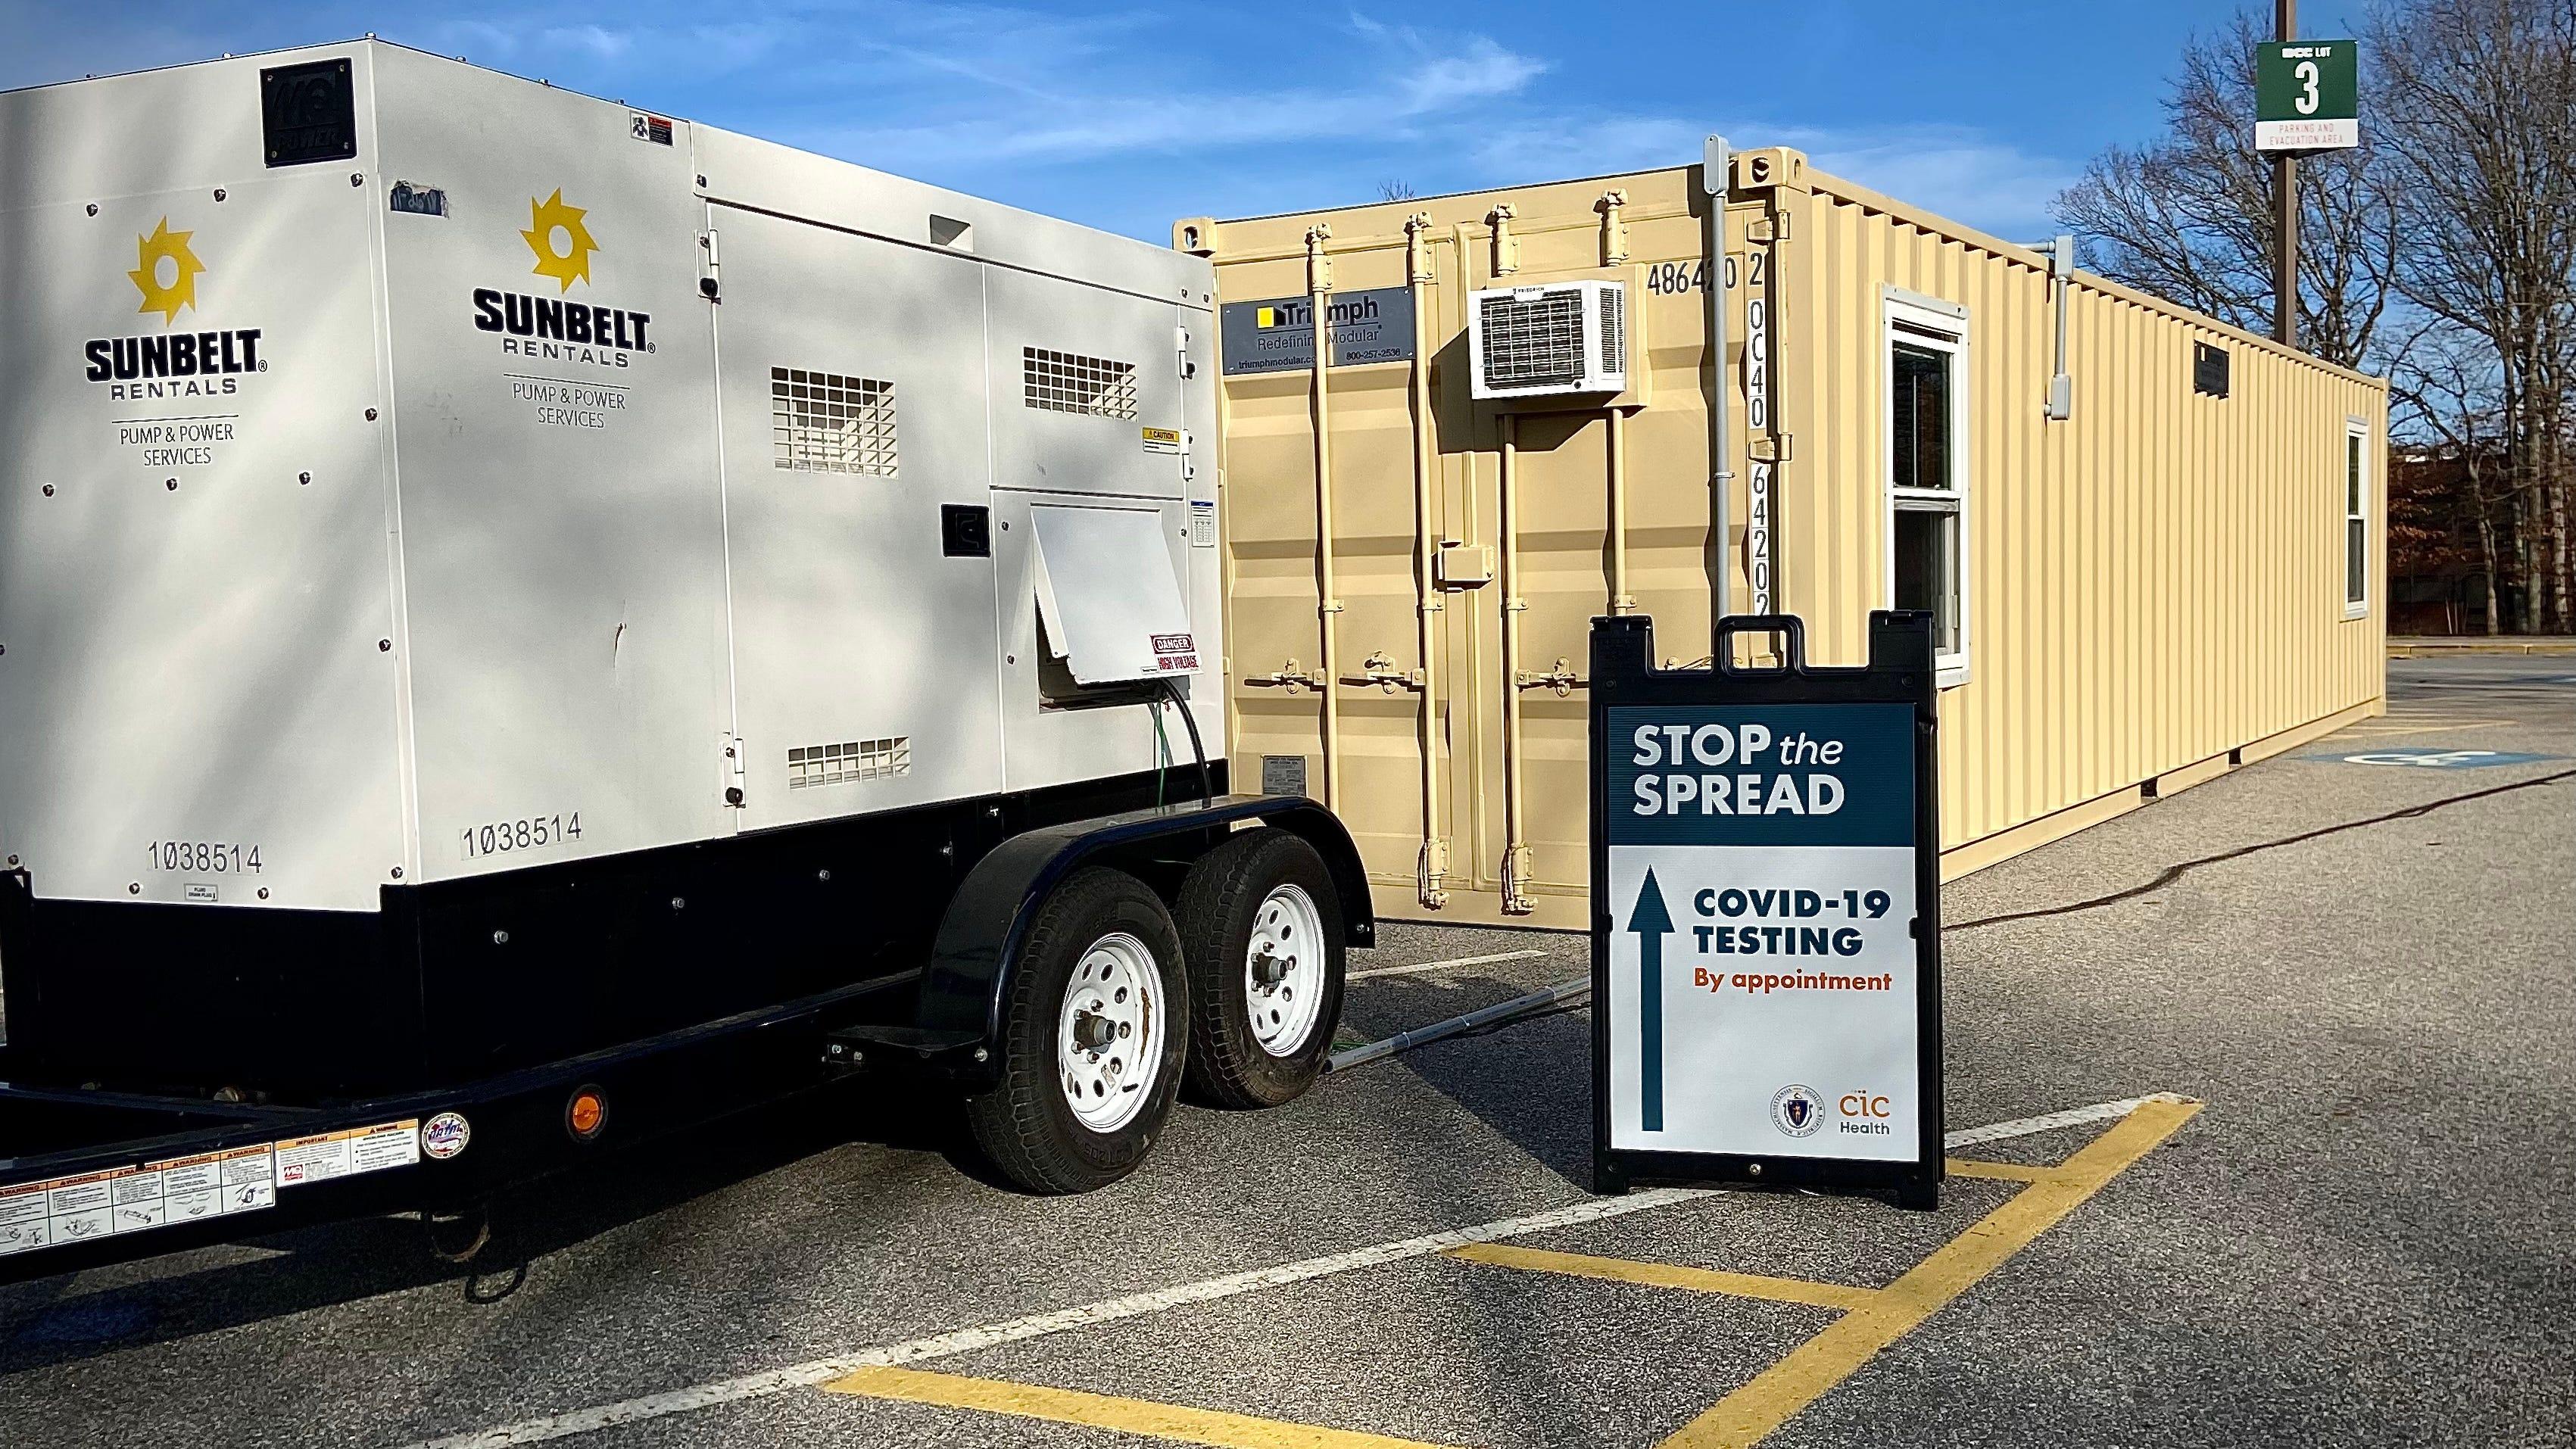 Cambridge company offering free COVID testing in Fall River